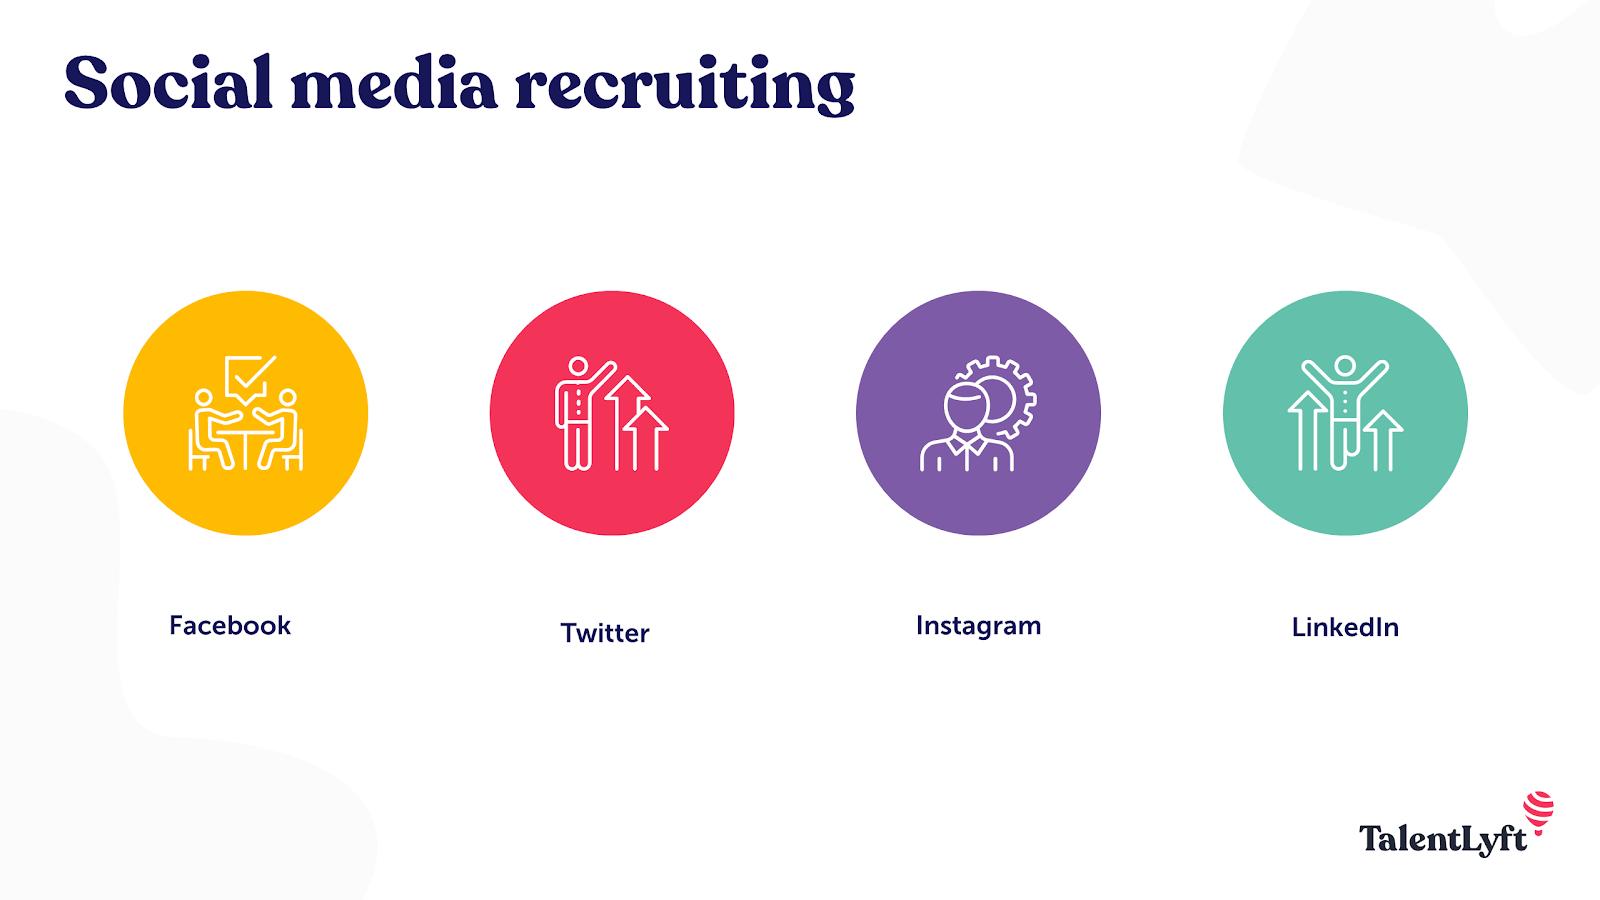 Social media recruitment platforms